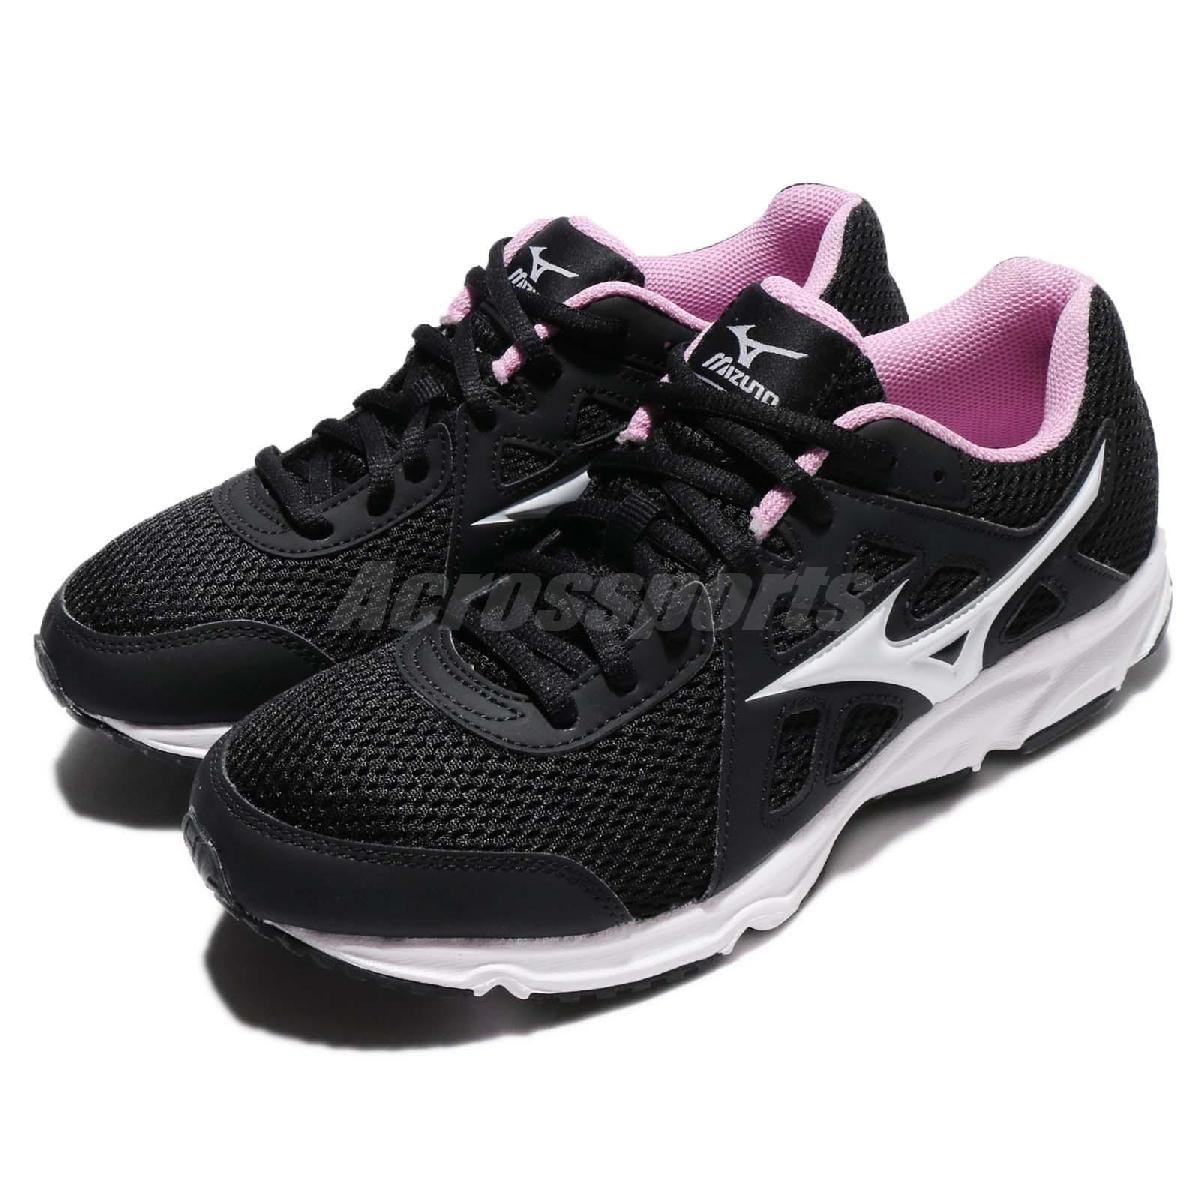 Mizuno 慢跑鞋 Maximizer 19 黑 白 網布 透氣輕量 黑白 運動鞋 基本款 女鞋【PUMP306】 K1GA170101